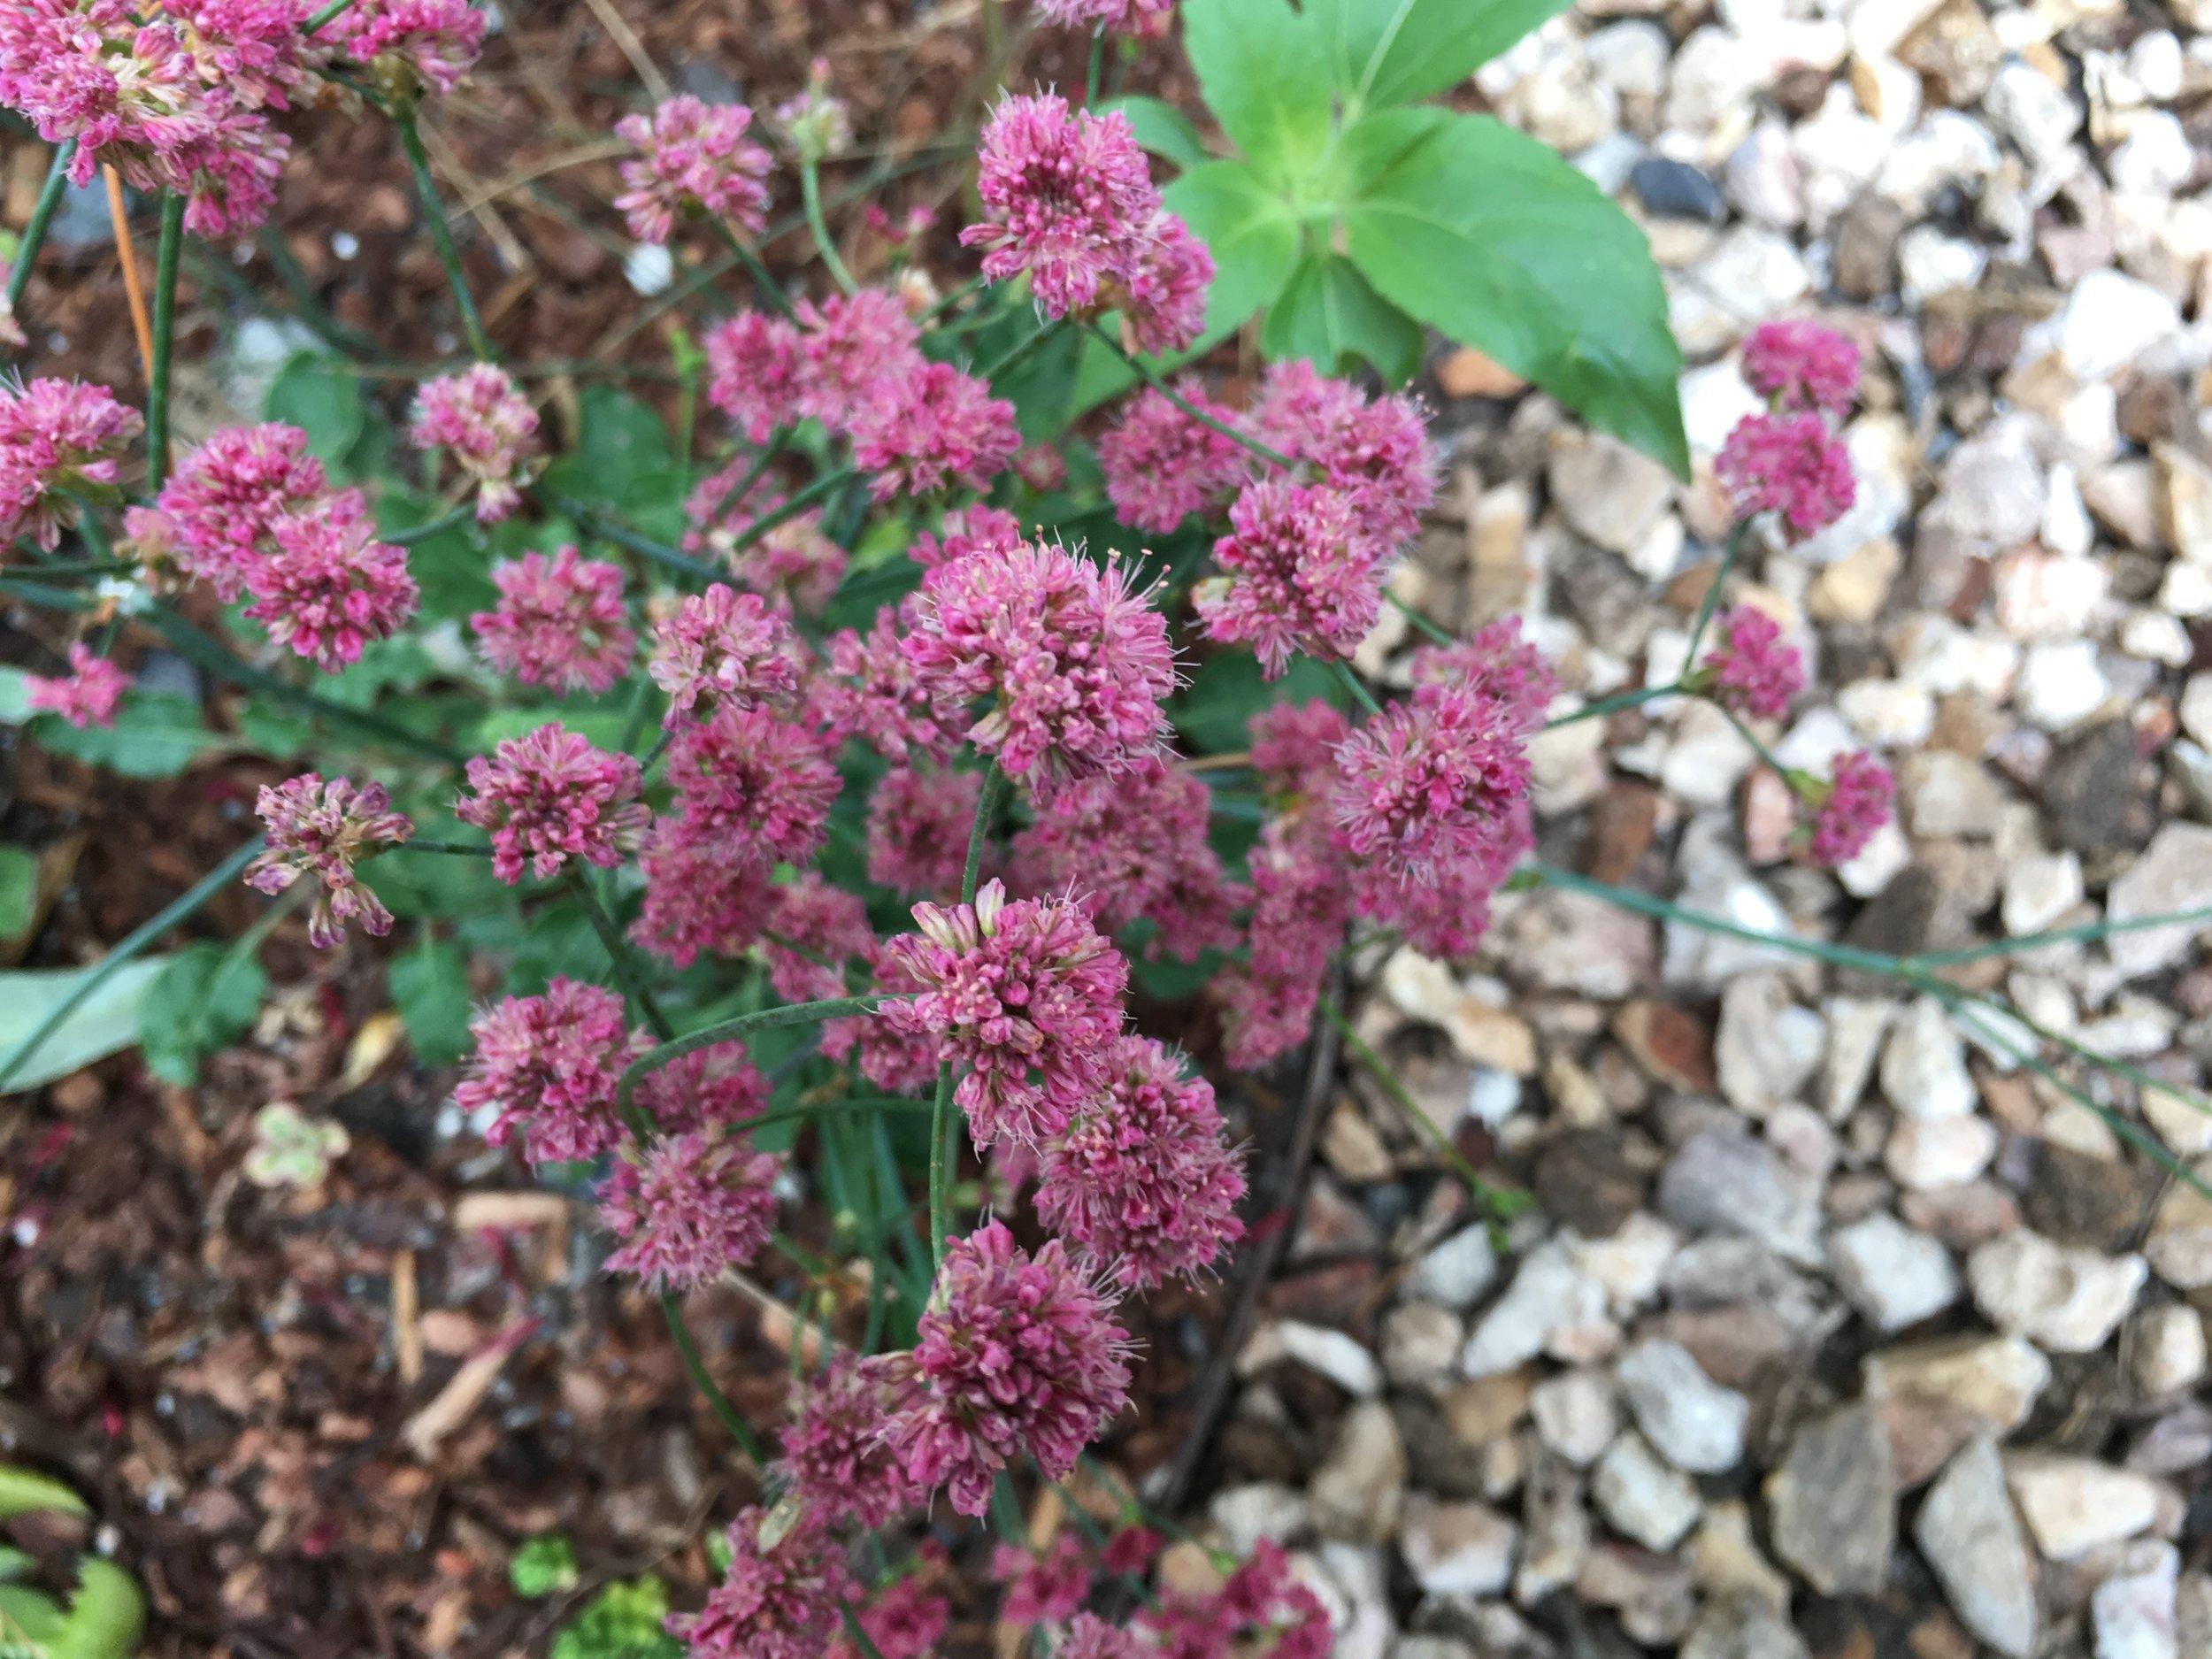 _2018_Mertens_Planting_Buckwheat_Pathway.jpg